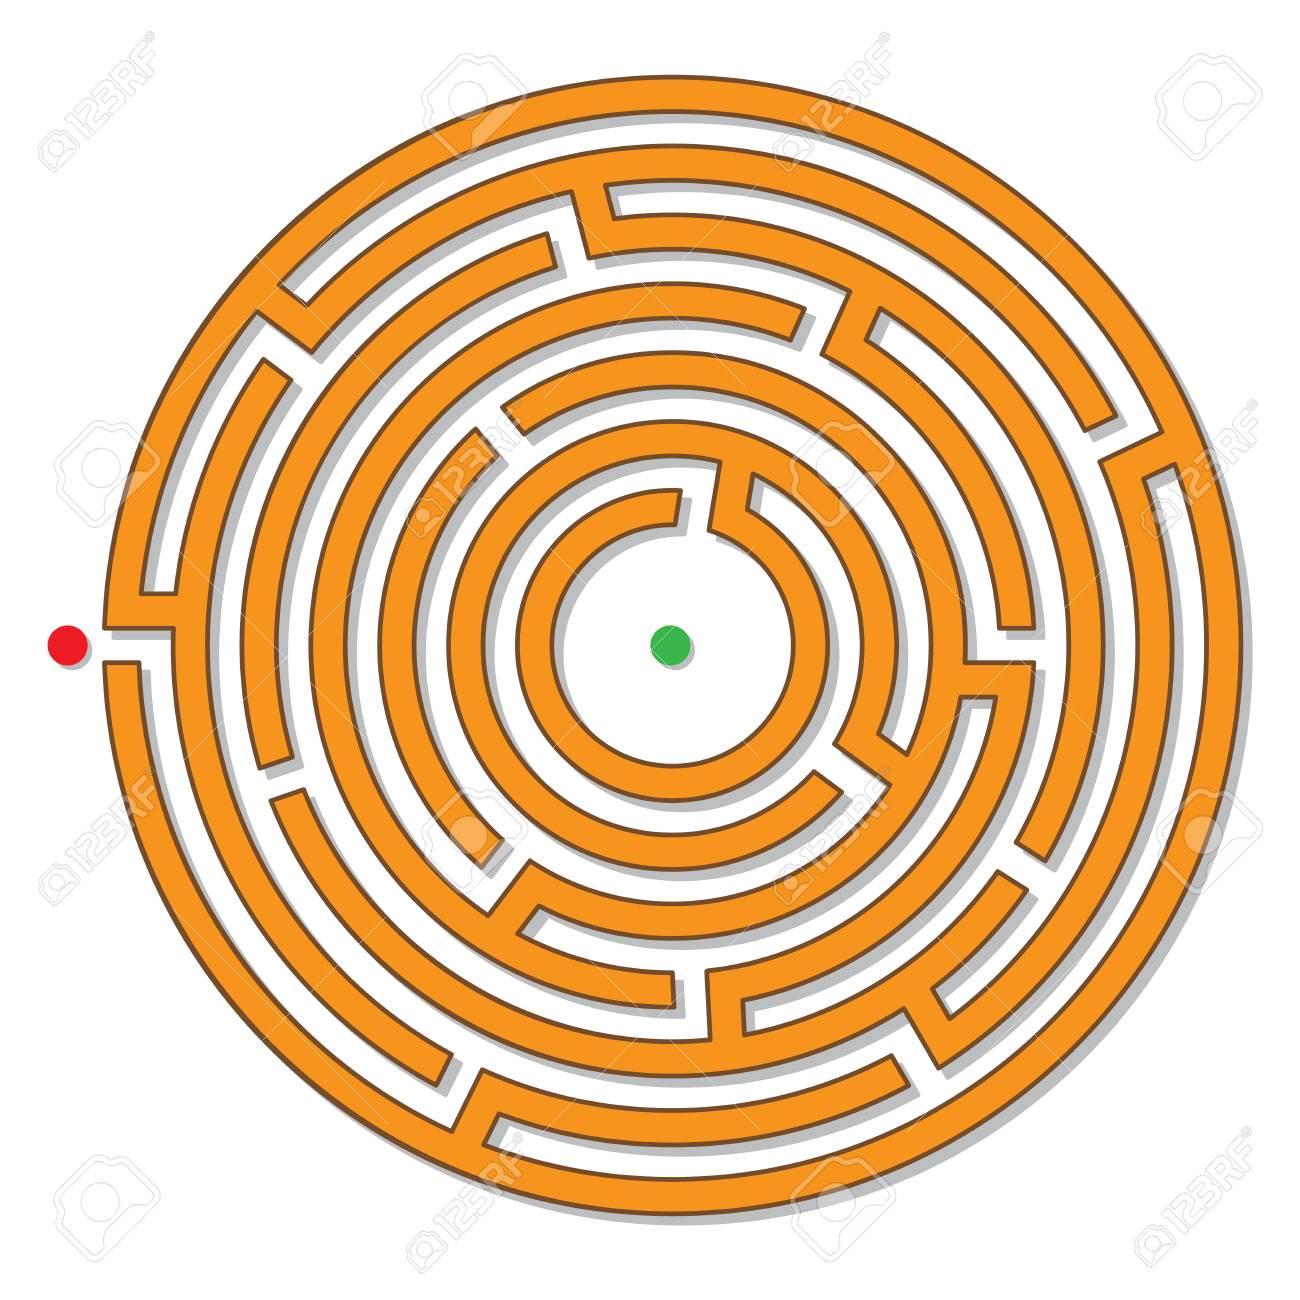 Circular Maze Labyrinth Logical Puzzle Vector Stock Photo